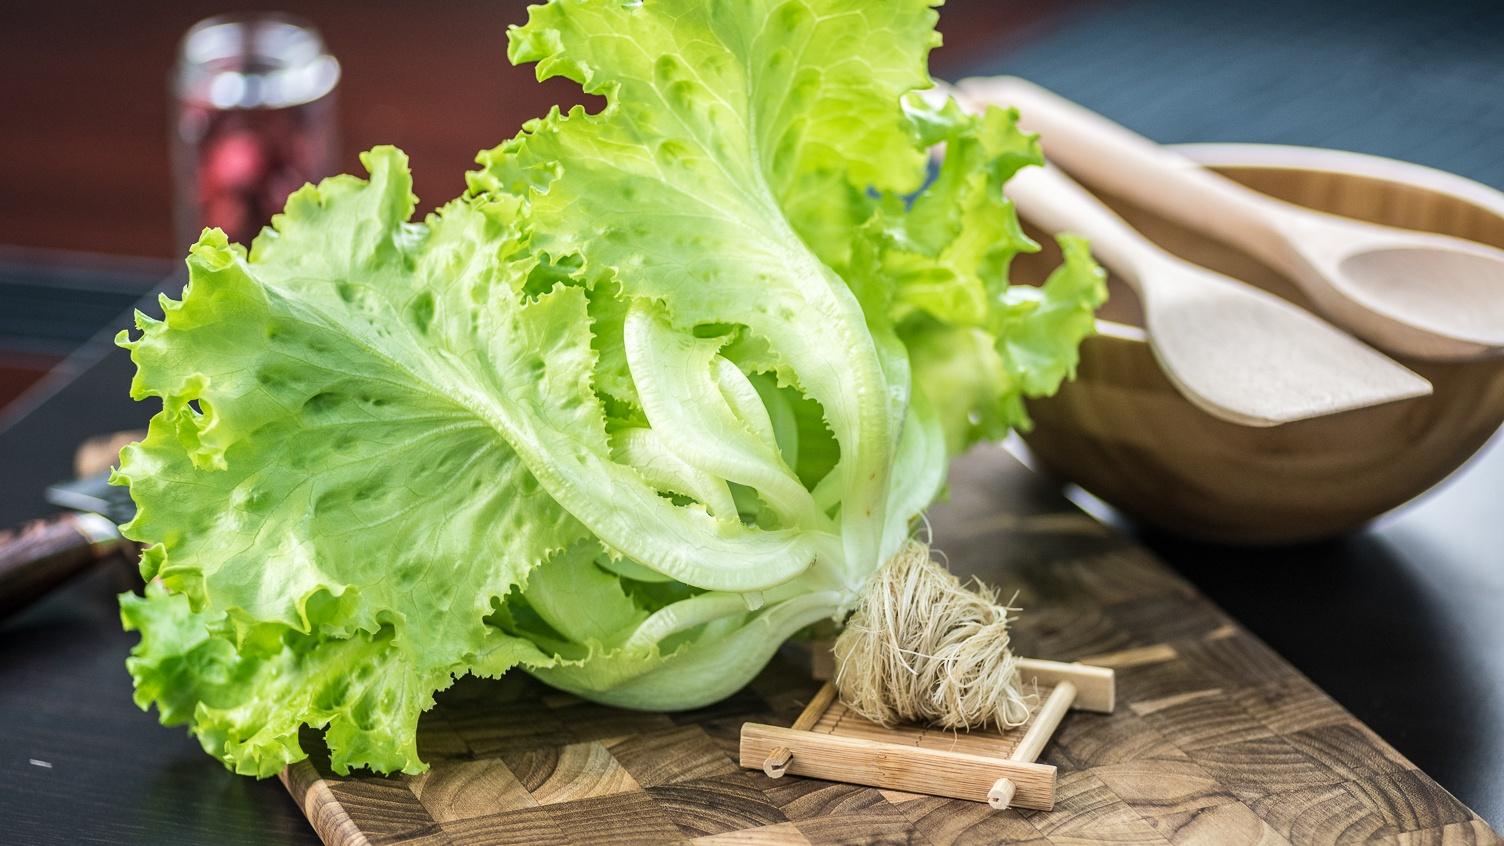 AEssenseGrows Green Floral Leaf Lettuce